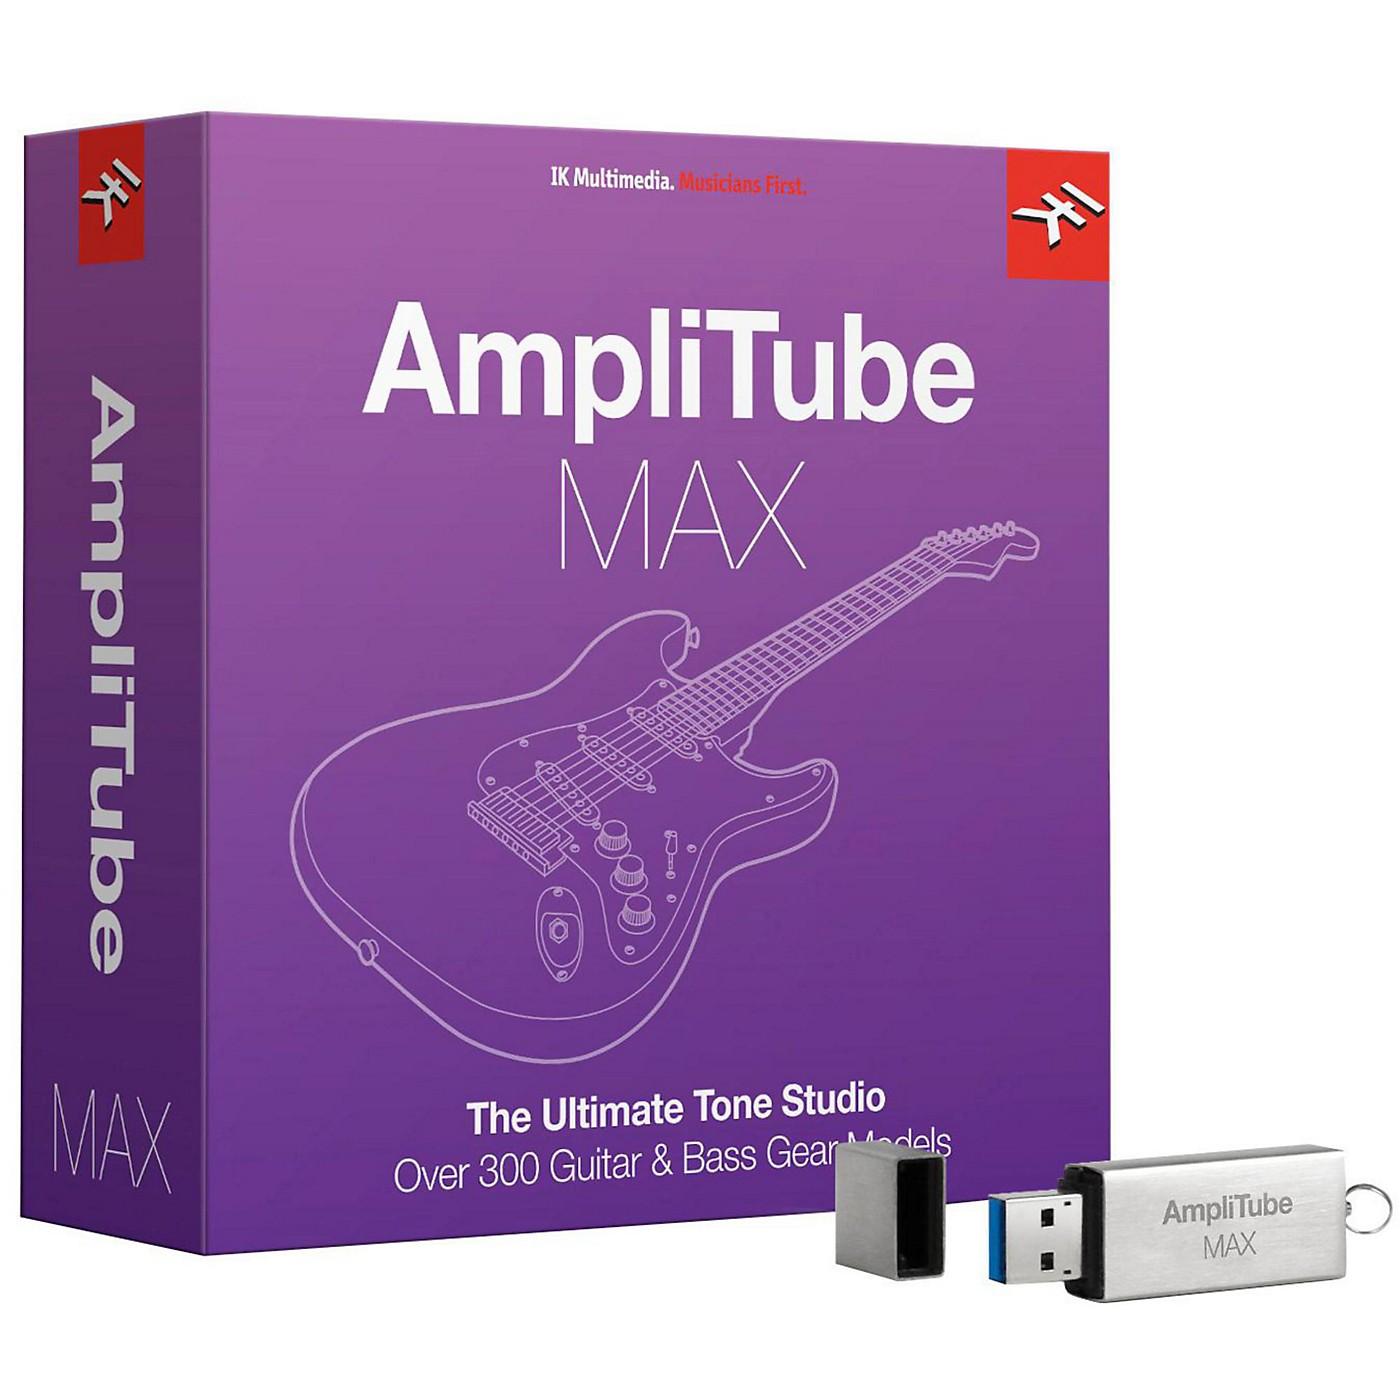 IK Multimedia AmpliTube MAX thumbnail